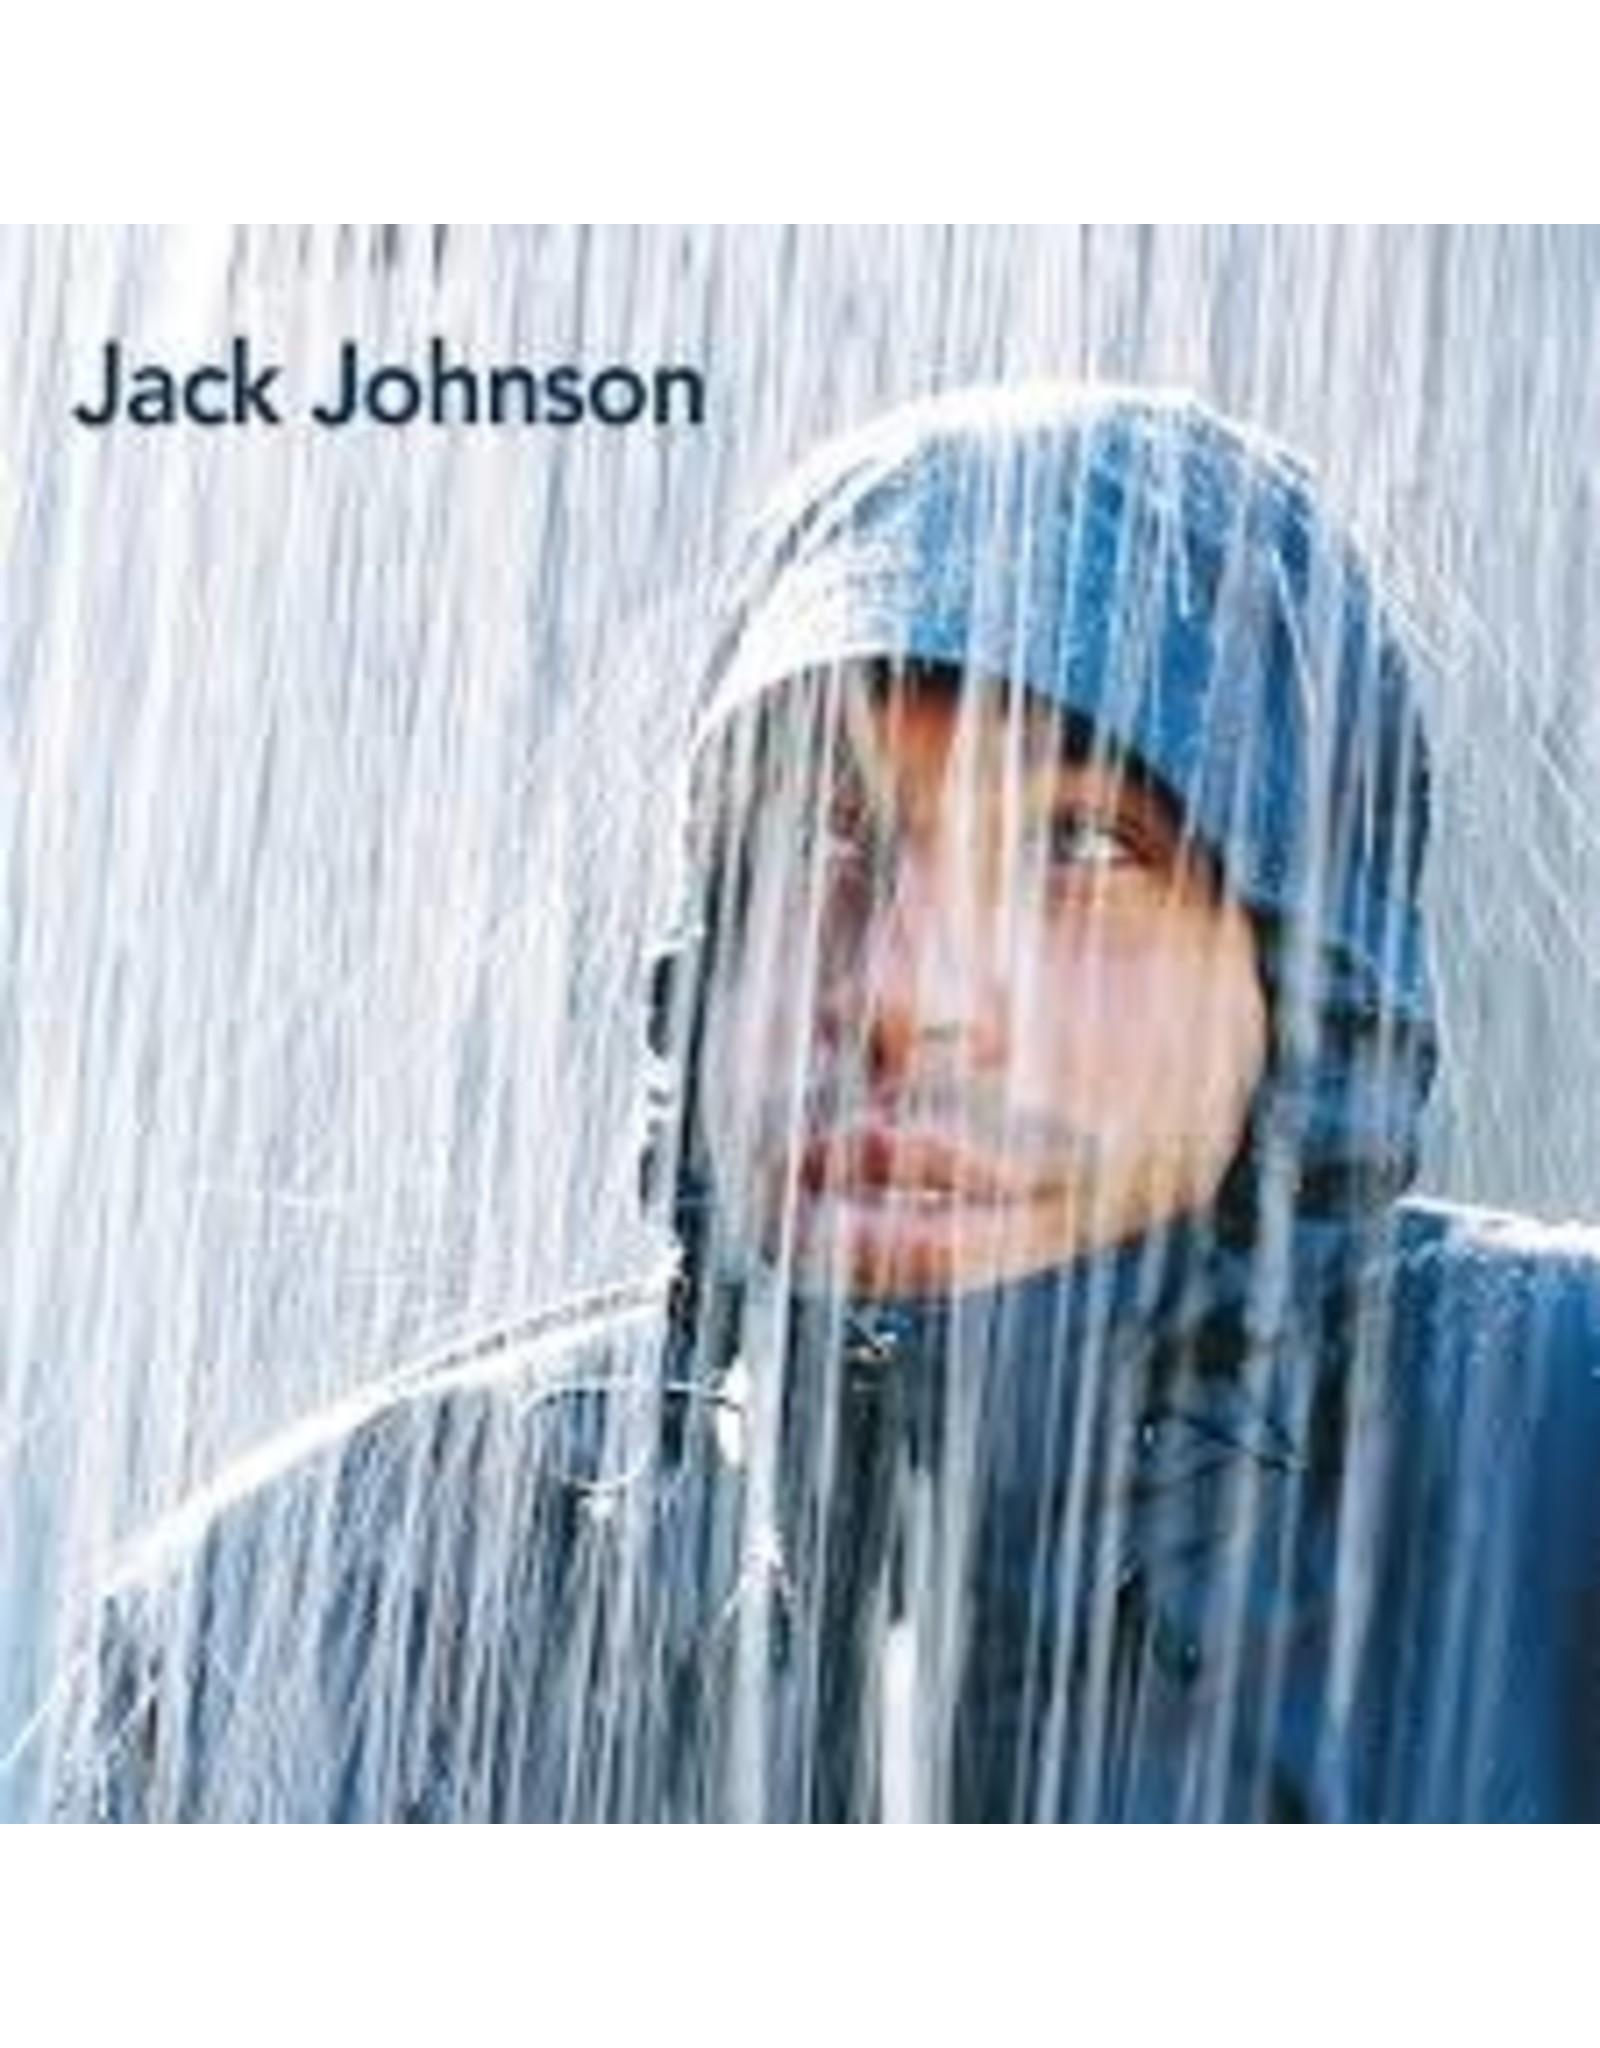 Jack Johnson - Brushfire Fairytales (20th Anniversary)